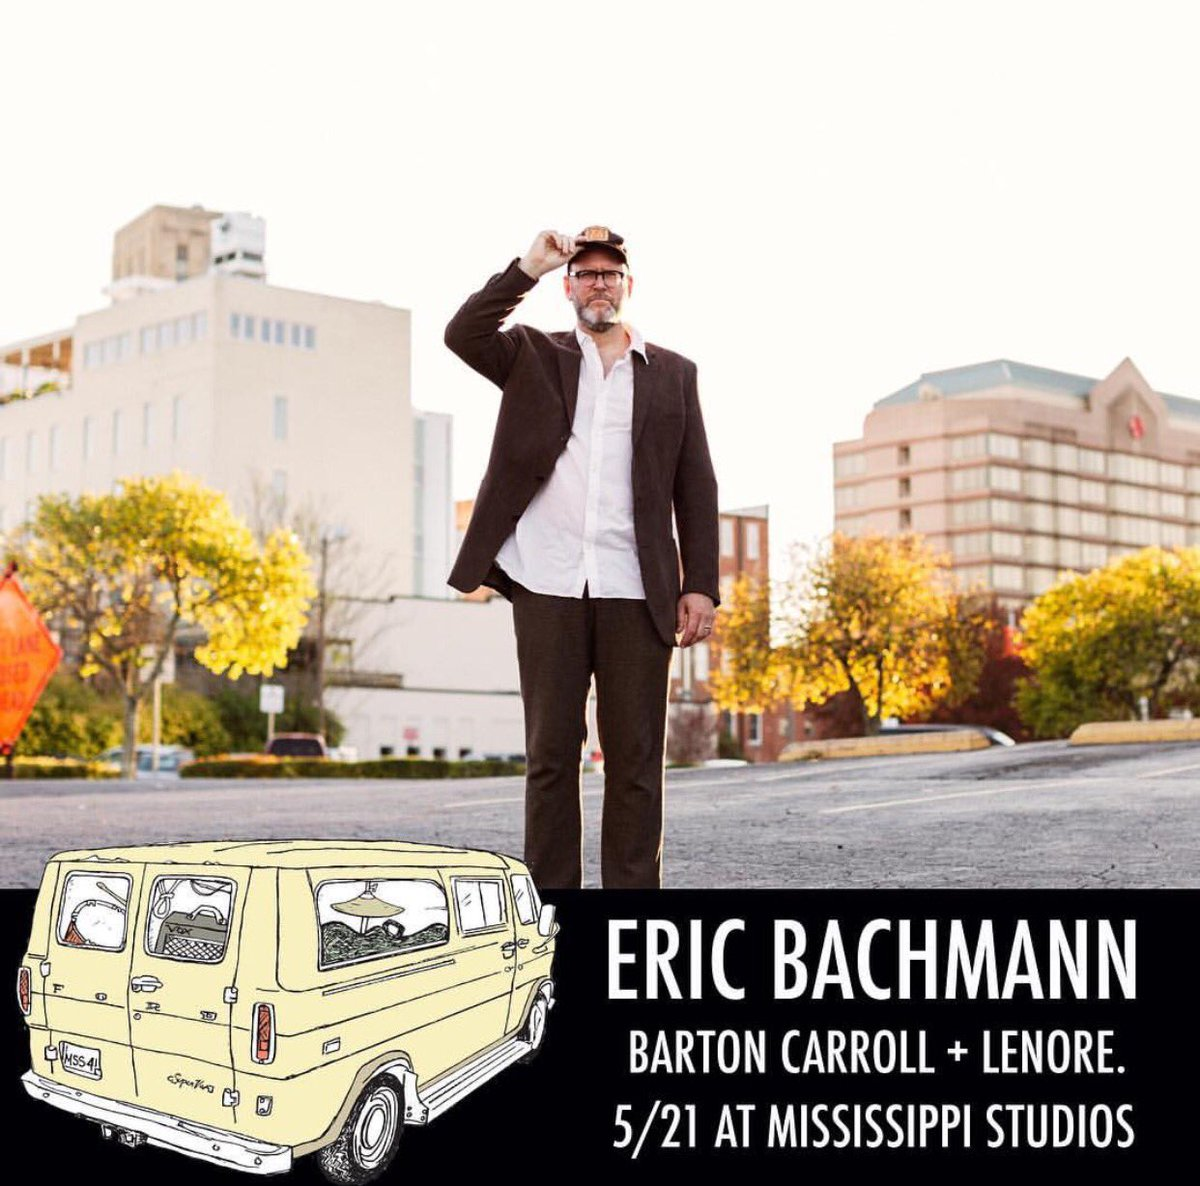 Killer show tonight w @Eric_Bachmann https://t.co/IjtkSQqdMH